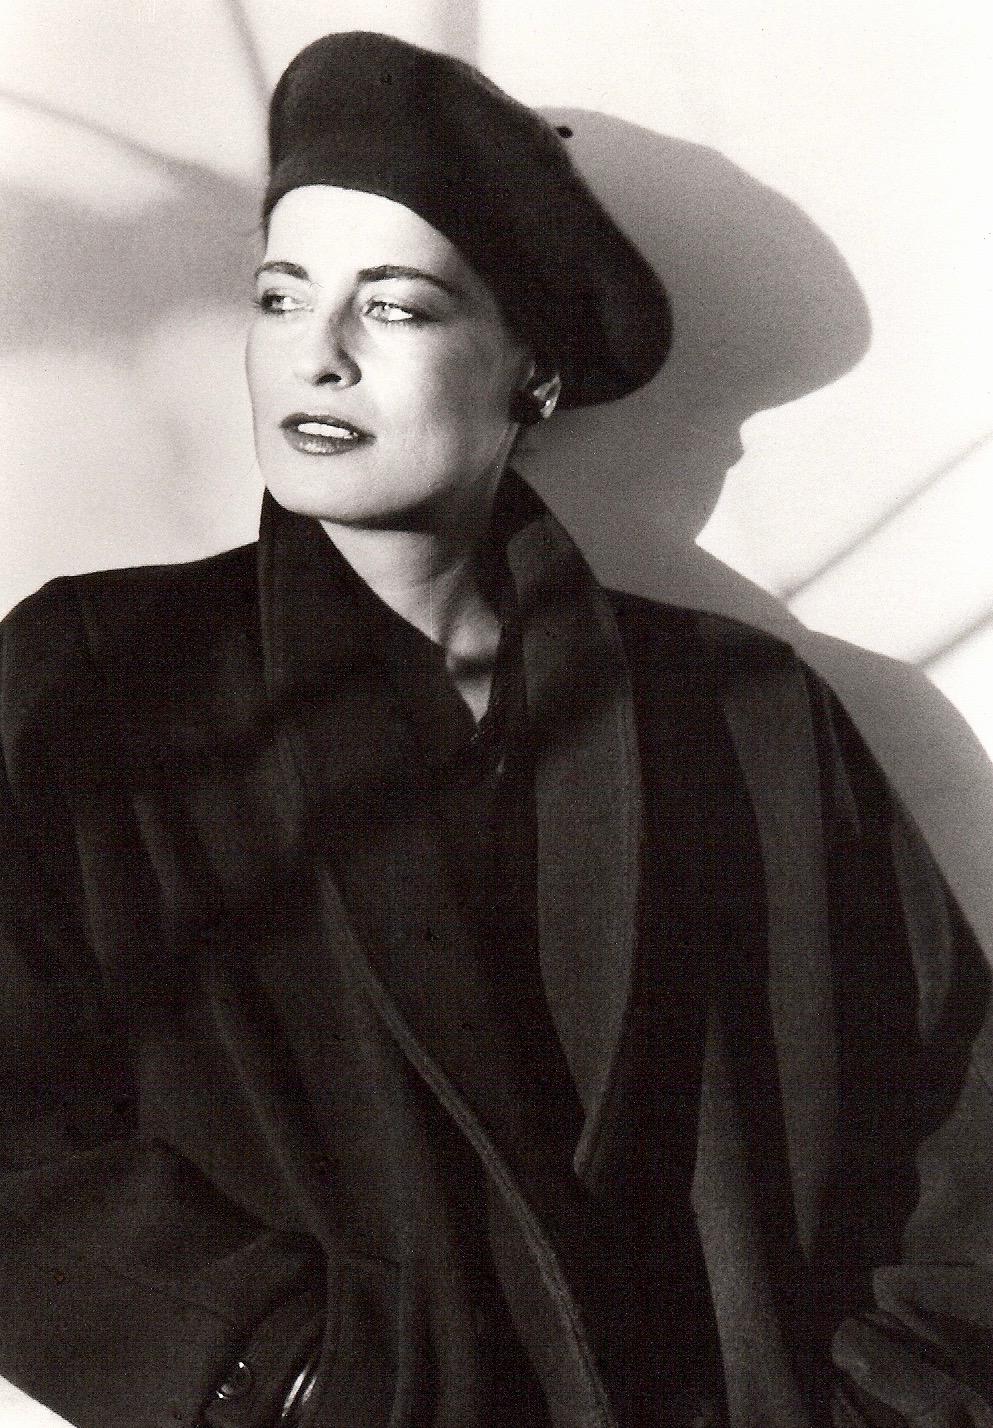 Julia King Photography - fashion, advertising, portrait, fine art - New York City and Santa Fe, New Mexico, 1980s